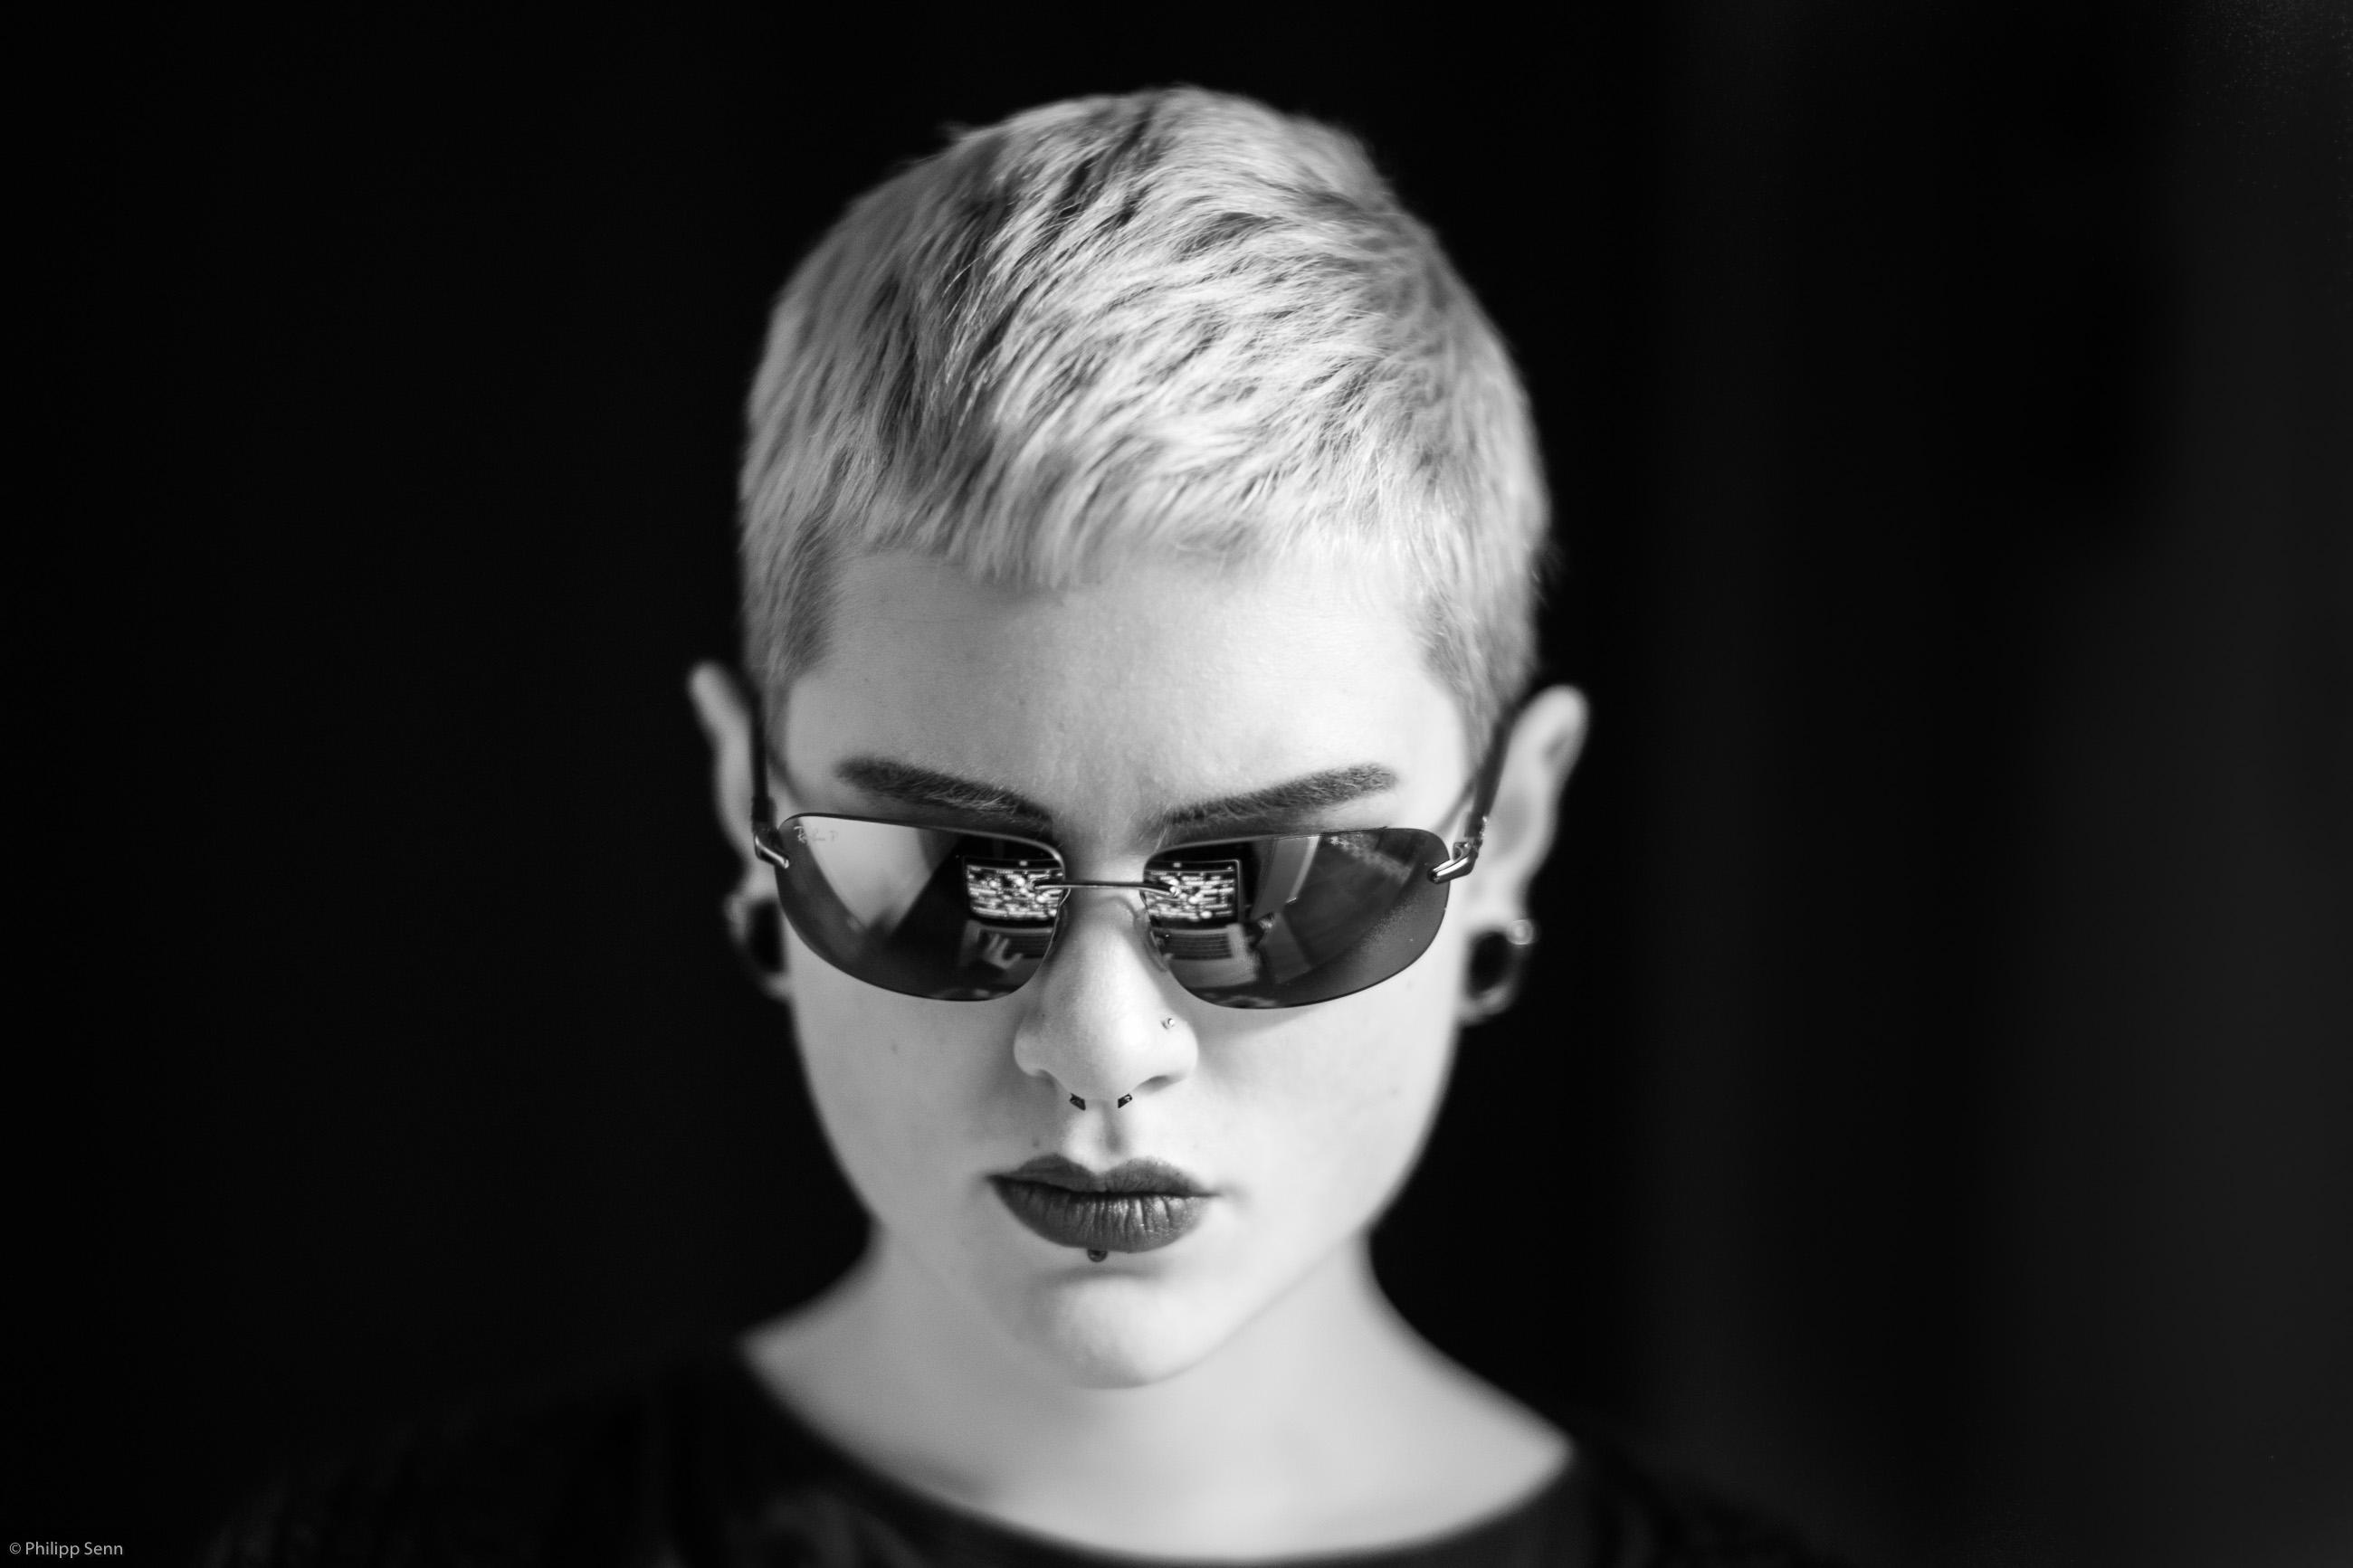 Millenium Model Schauspielerin Jamie Renée alias lisbeth salander